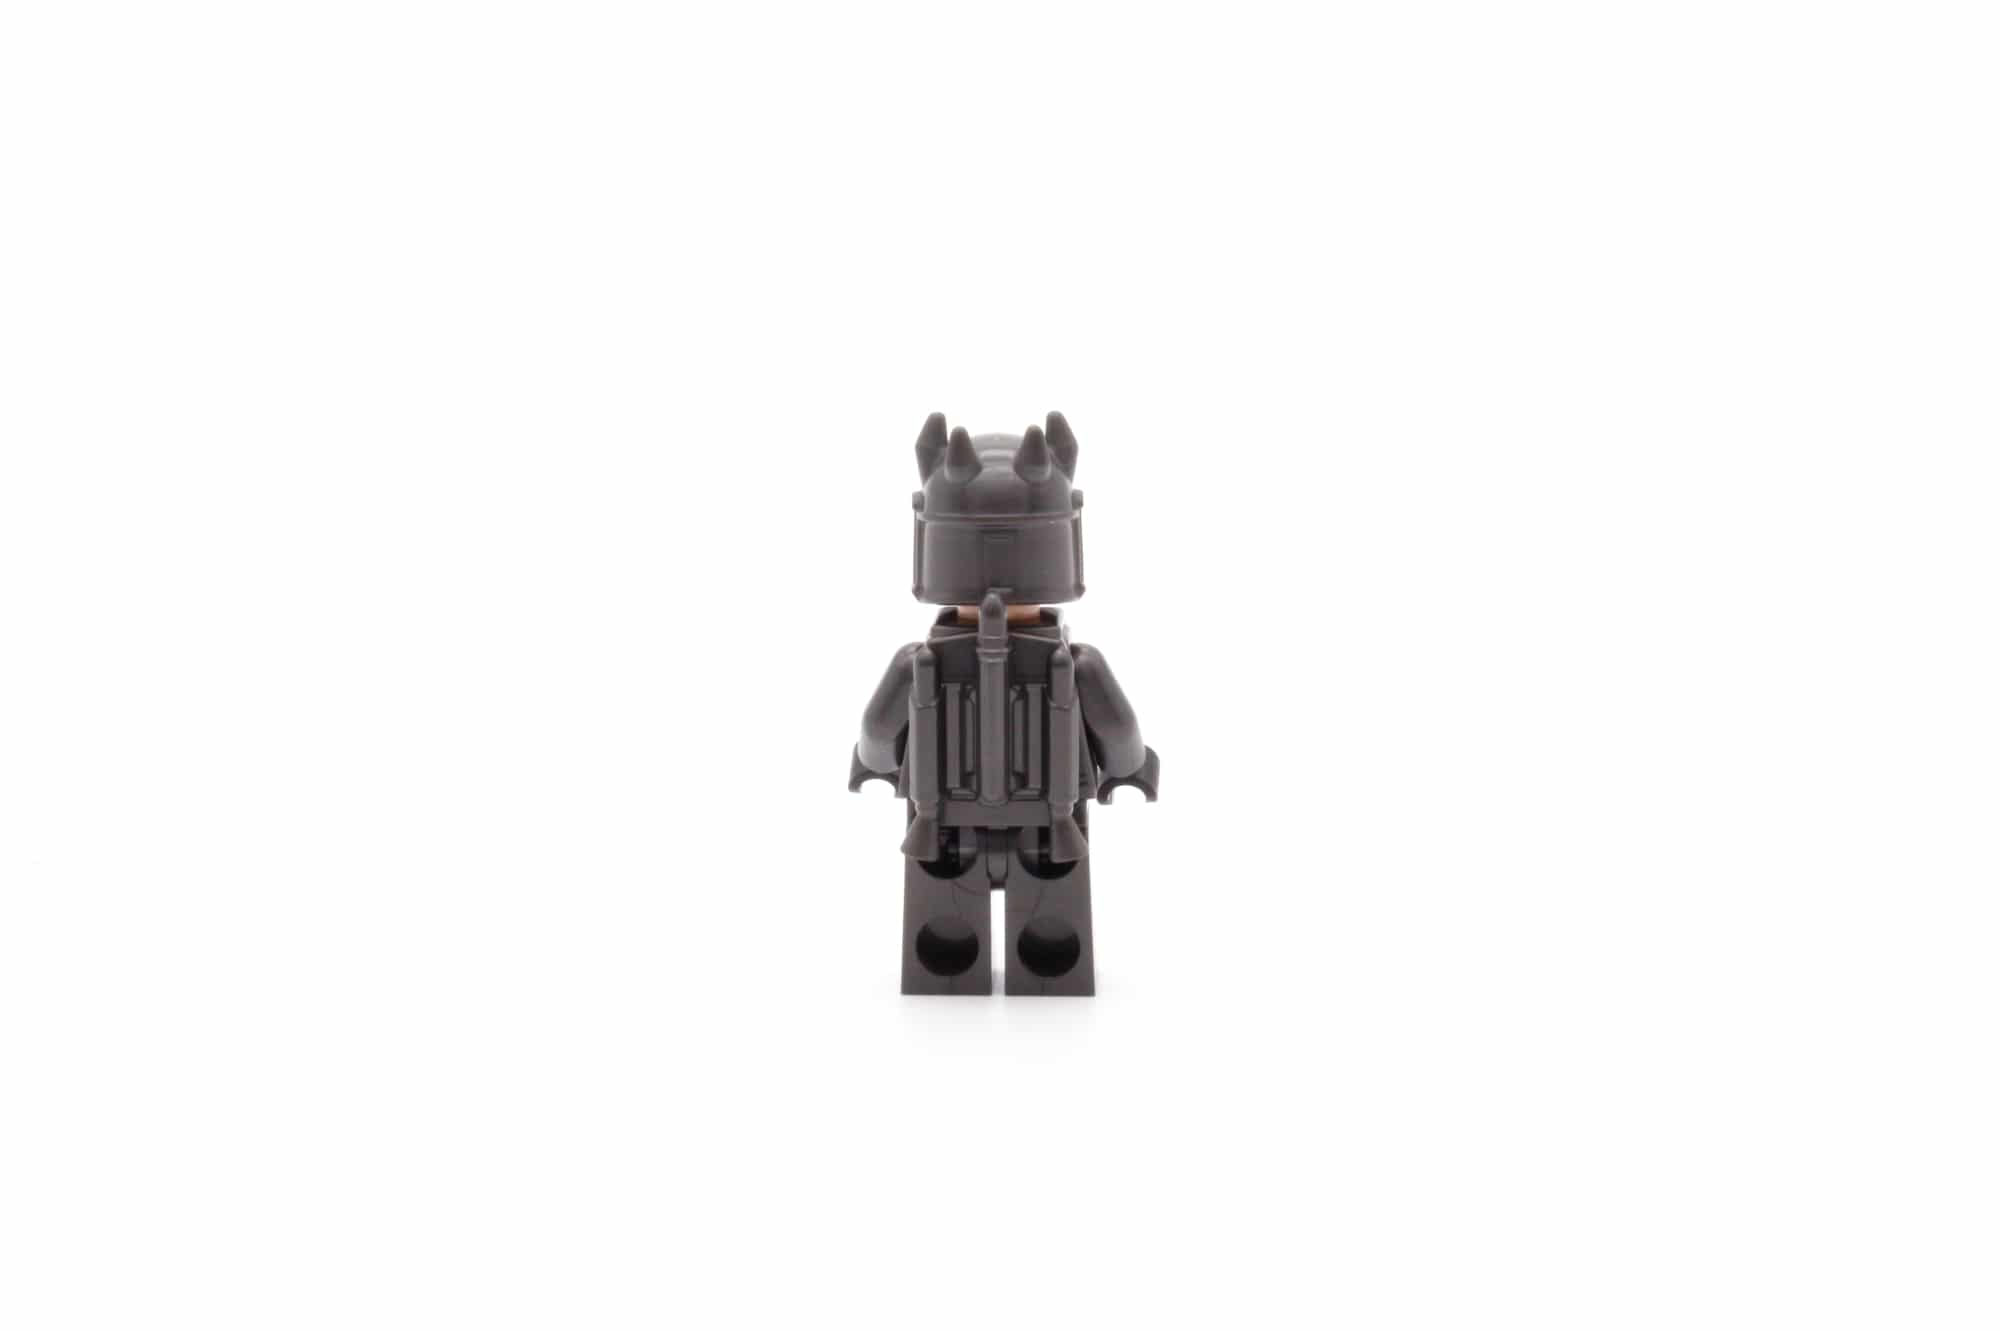 LEGO Star Wars 75316 Mandalorian Starfighter 9